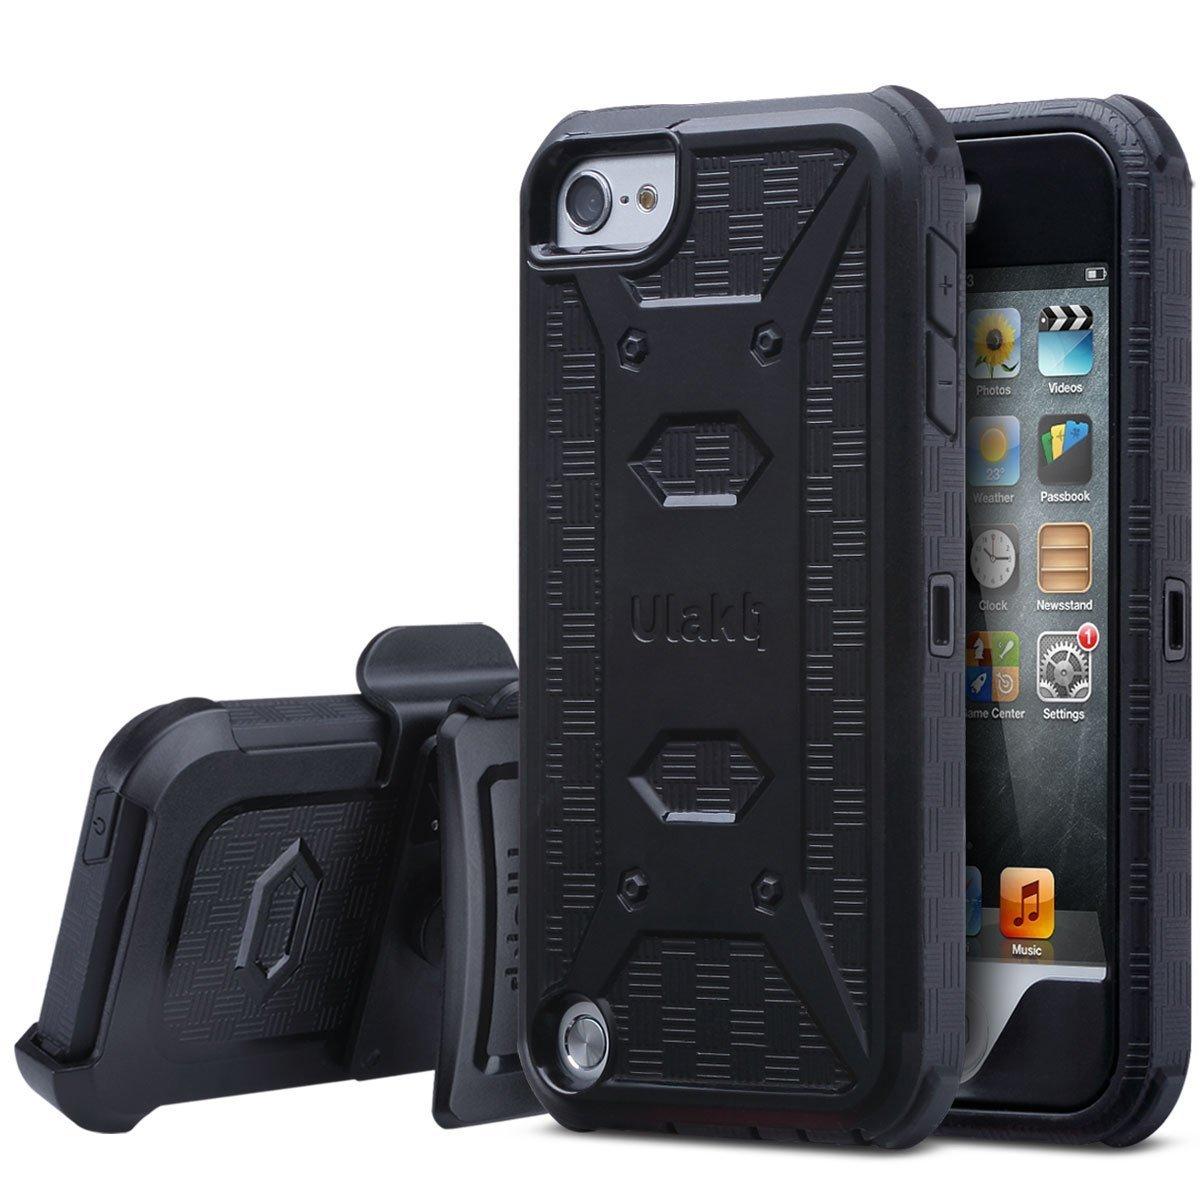 size 40 e139f 93d35 Cheap Ipod Touch Belt Case, find Ipod Touch Belt Case deals on line ...